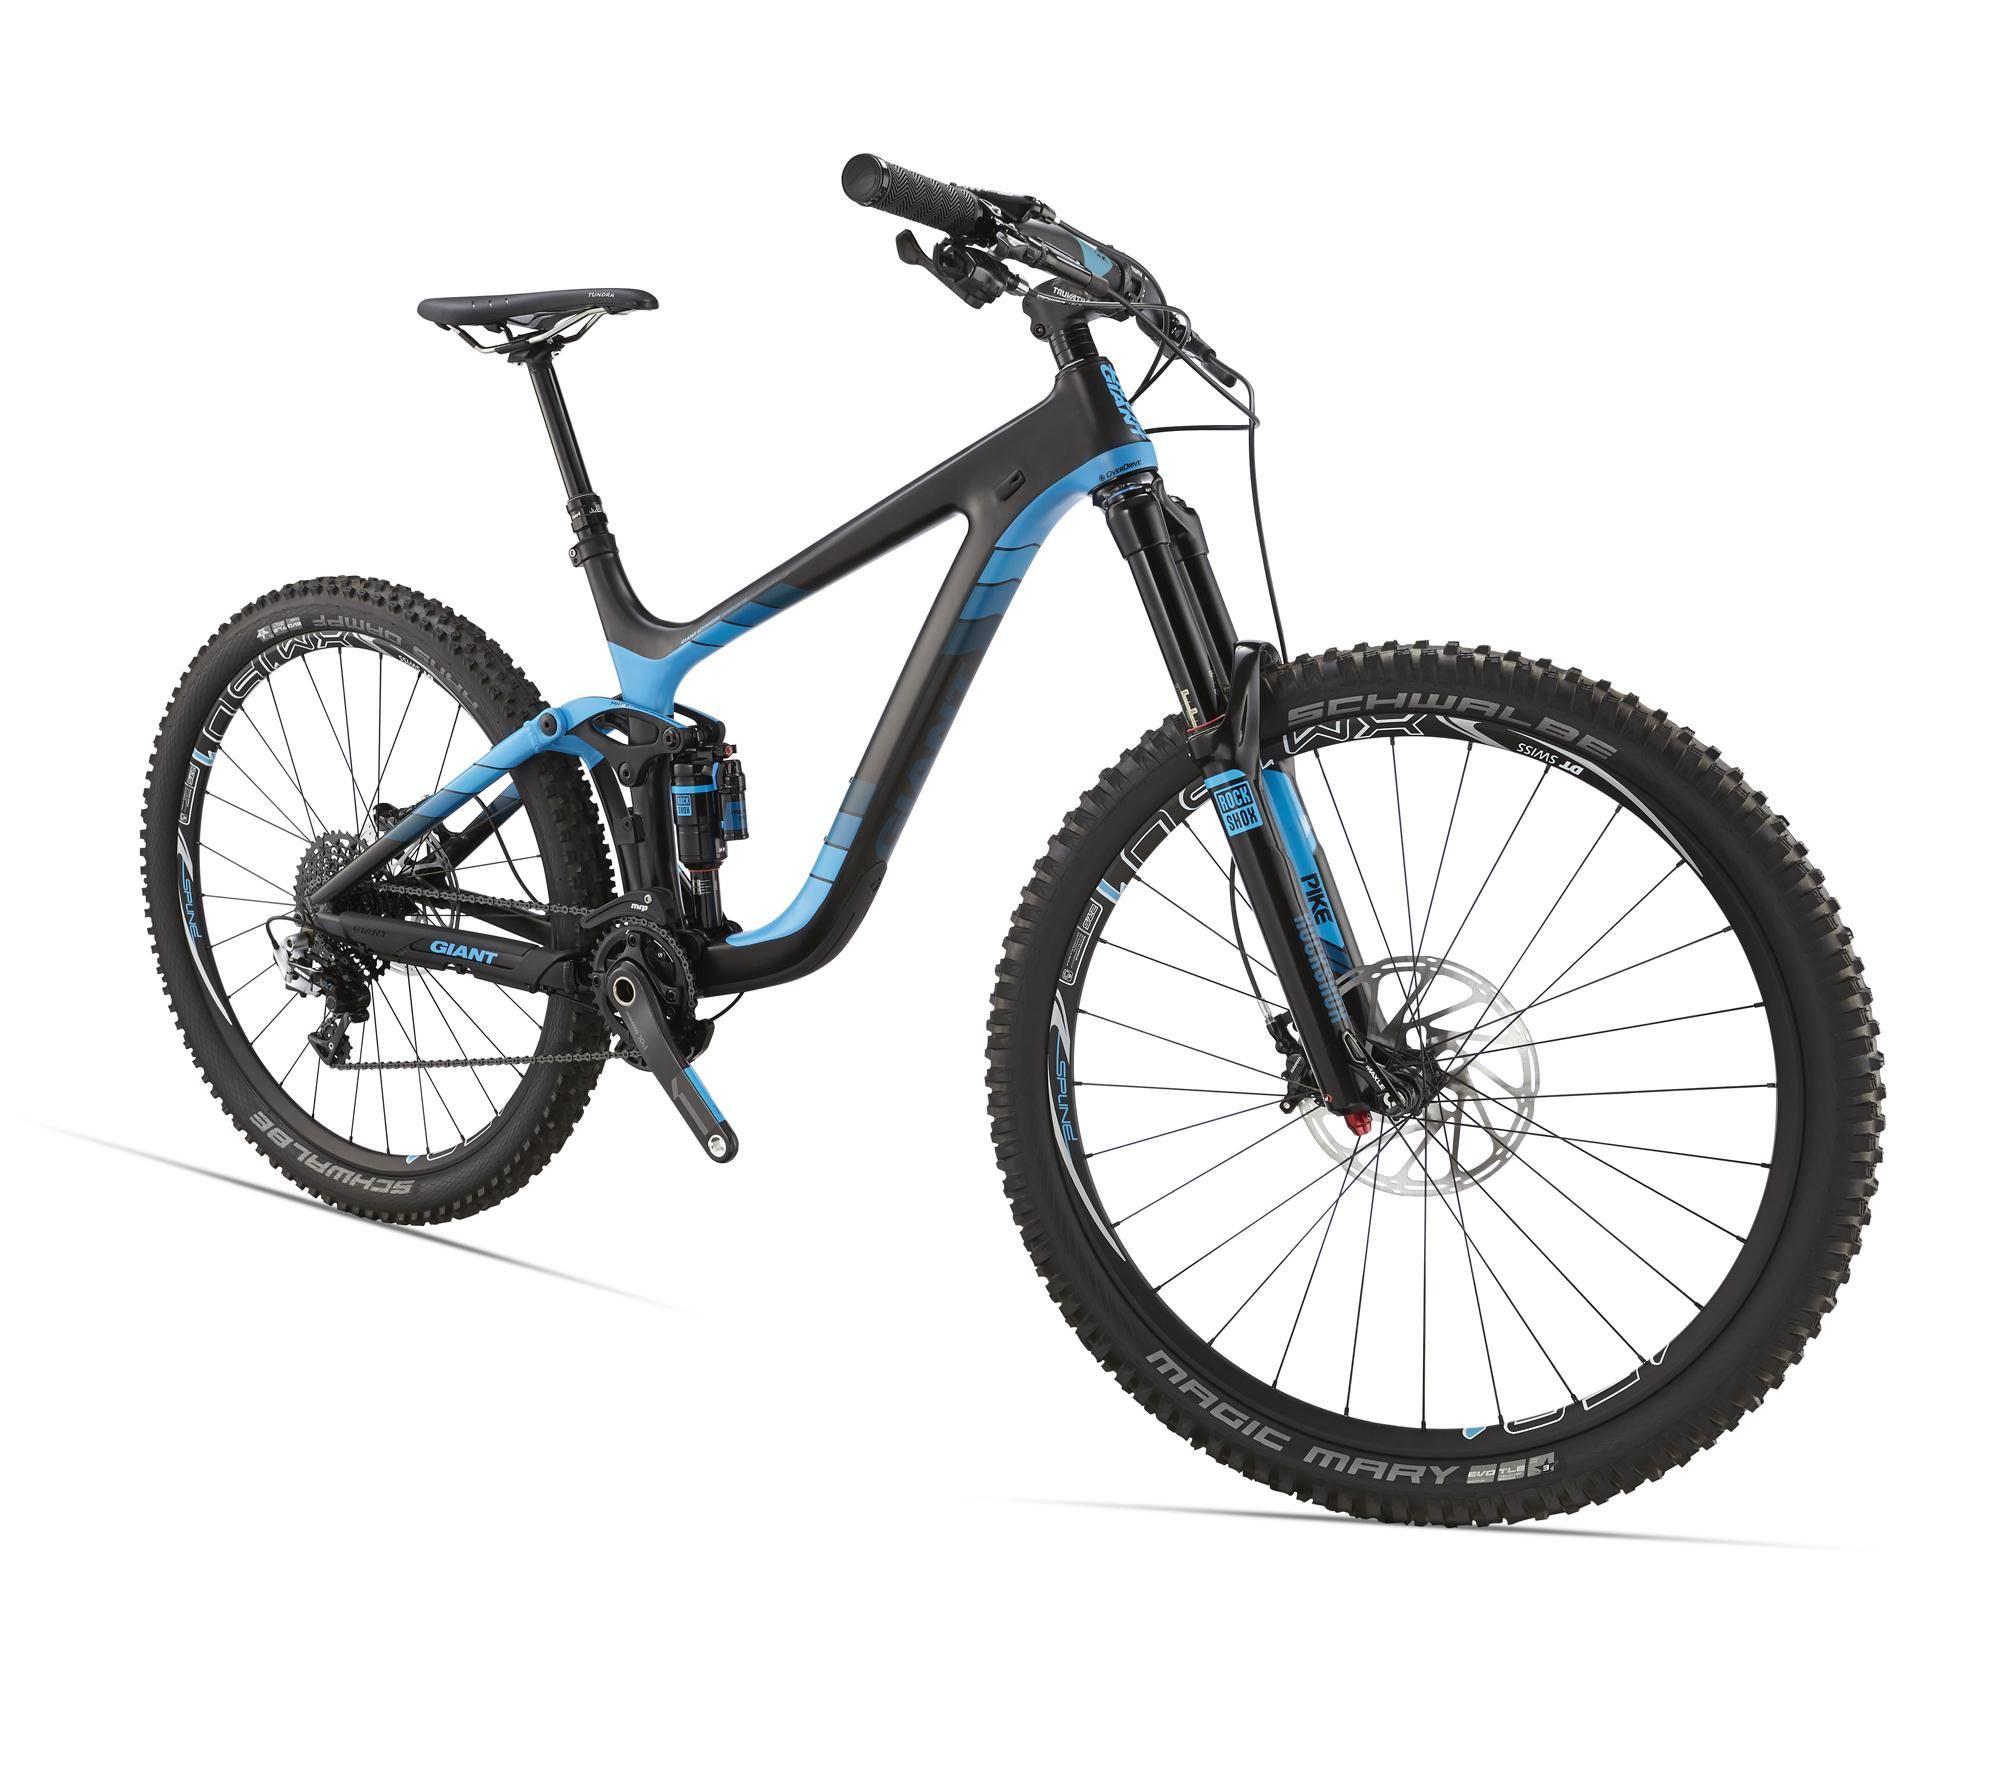 Reign Advanced 27 5 0 Team 2015 Giant Bicycles Espana Giant Bicycle Bicycle Bike